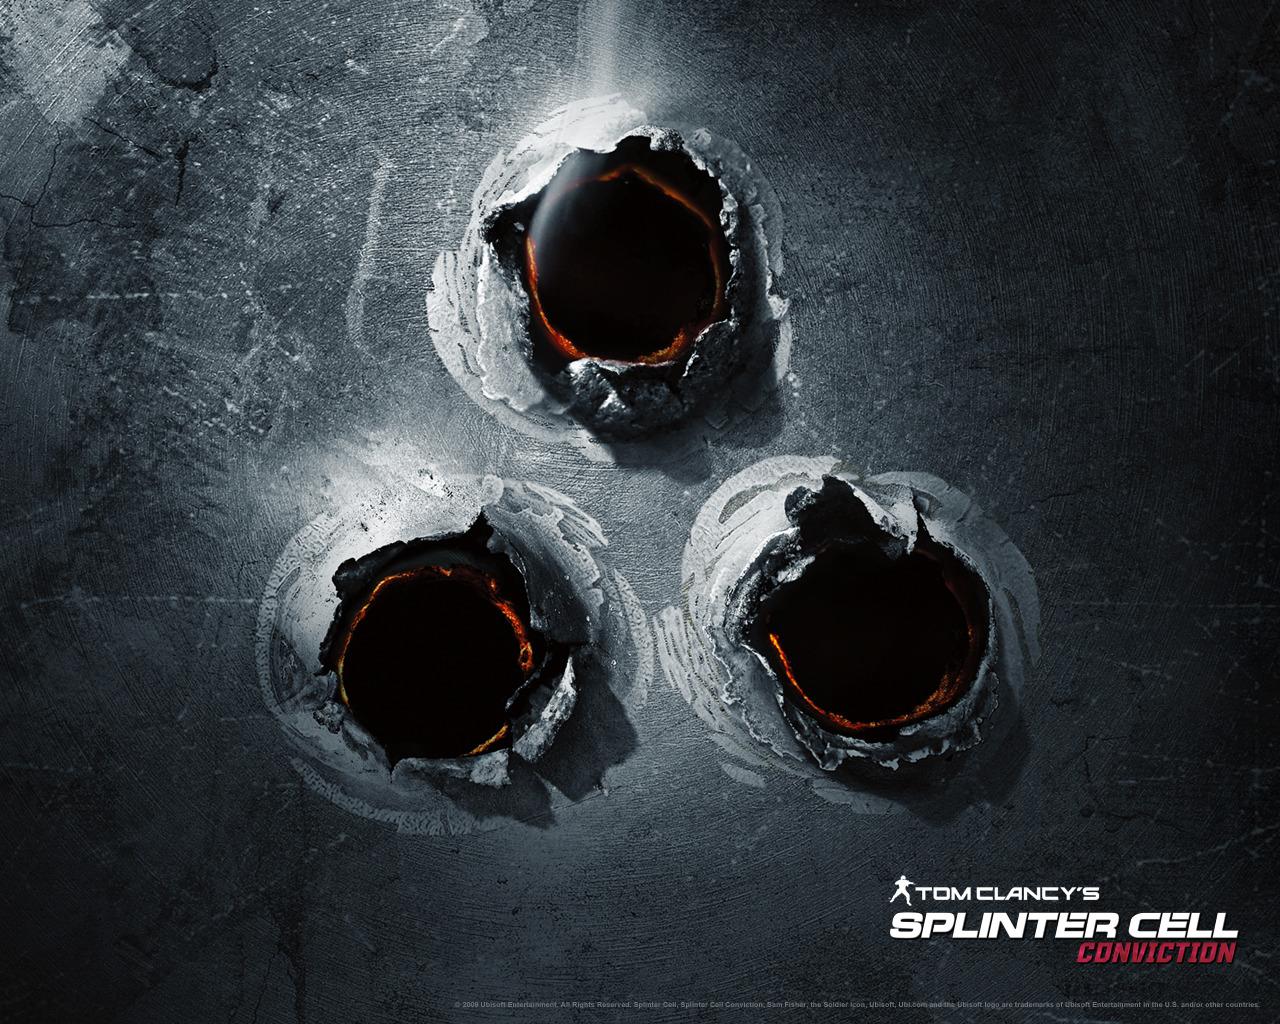 http://2.bp.blogspot.com/_nD_YgZuOadA/TJ7RiqiCGnI/AAAAAAAABKM/mJX37zKsufk/s1600/bullet-holes.jpg